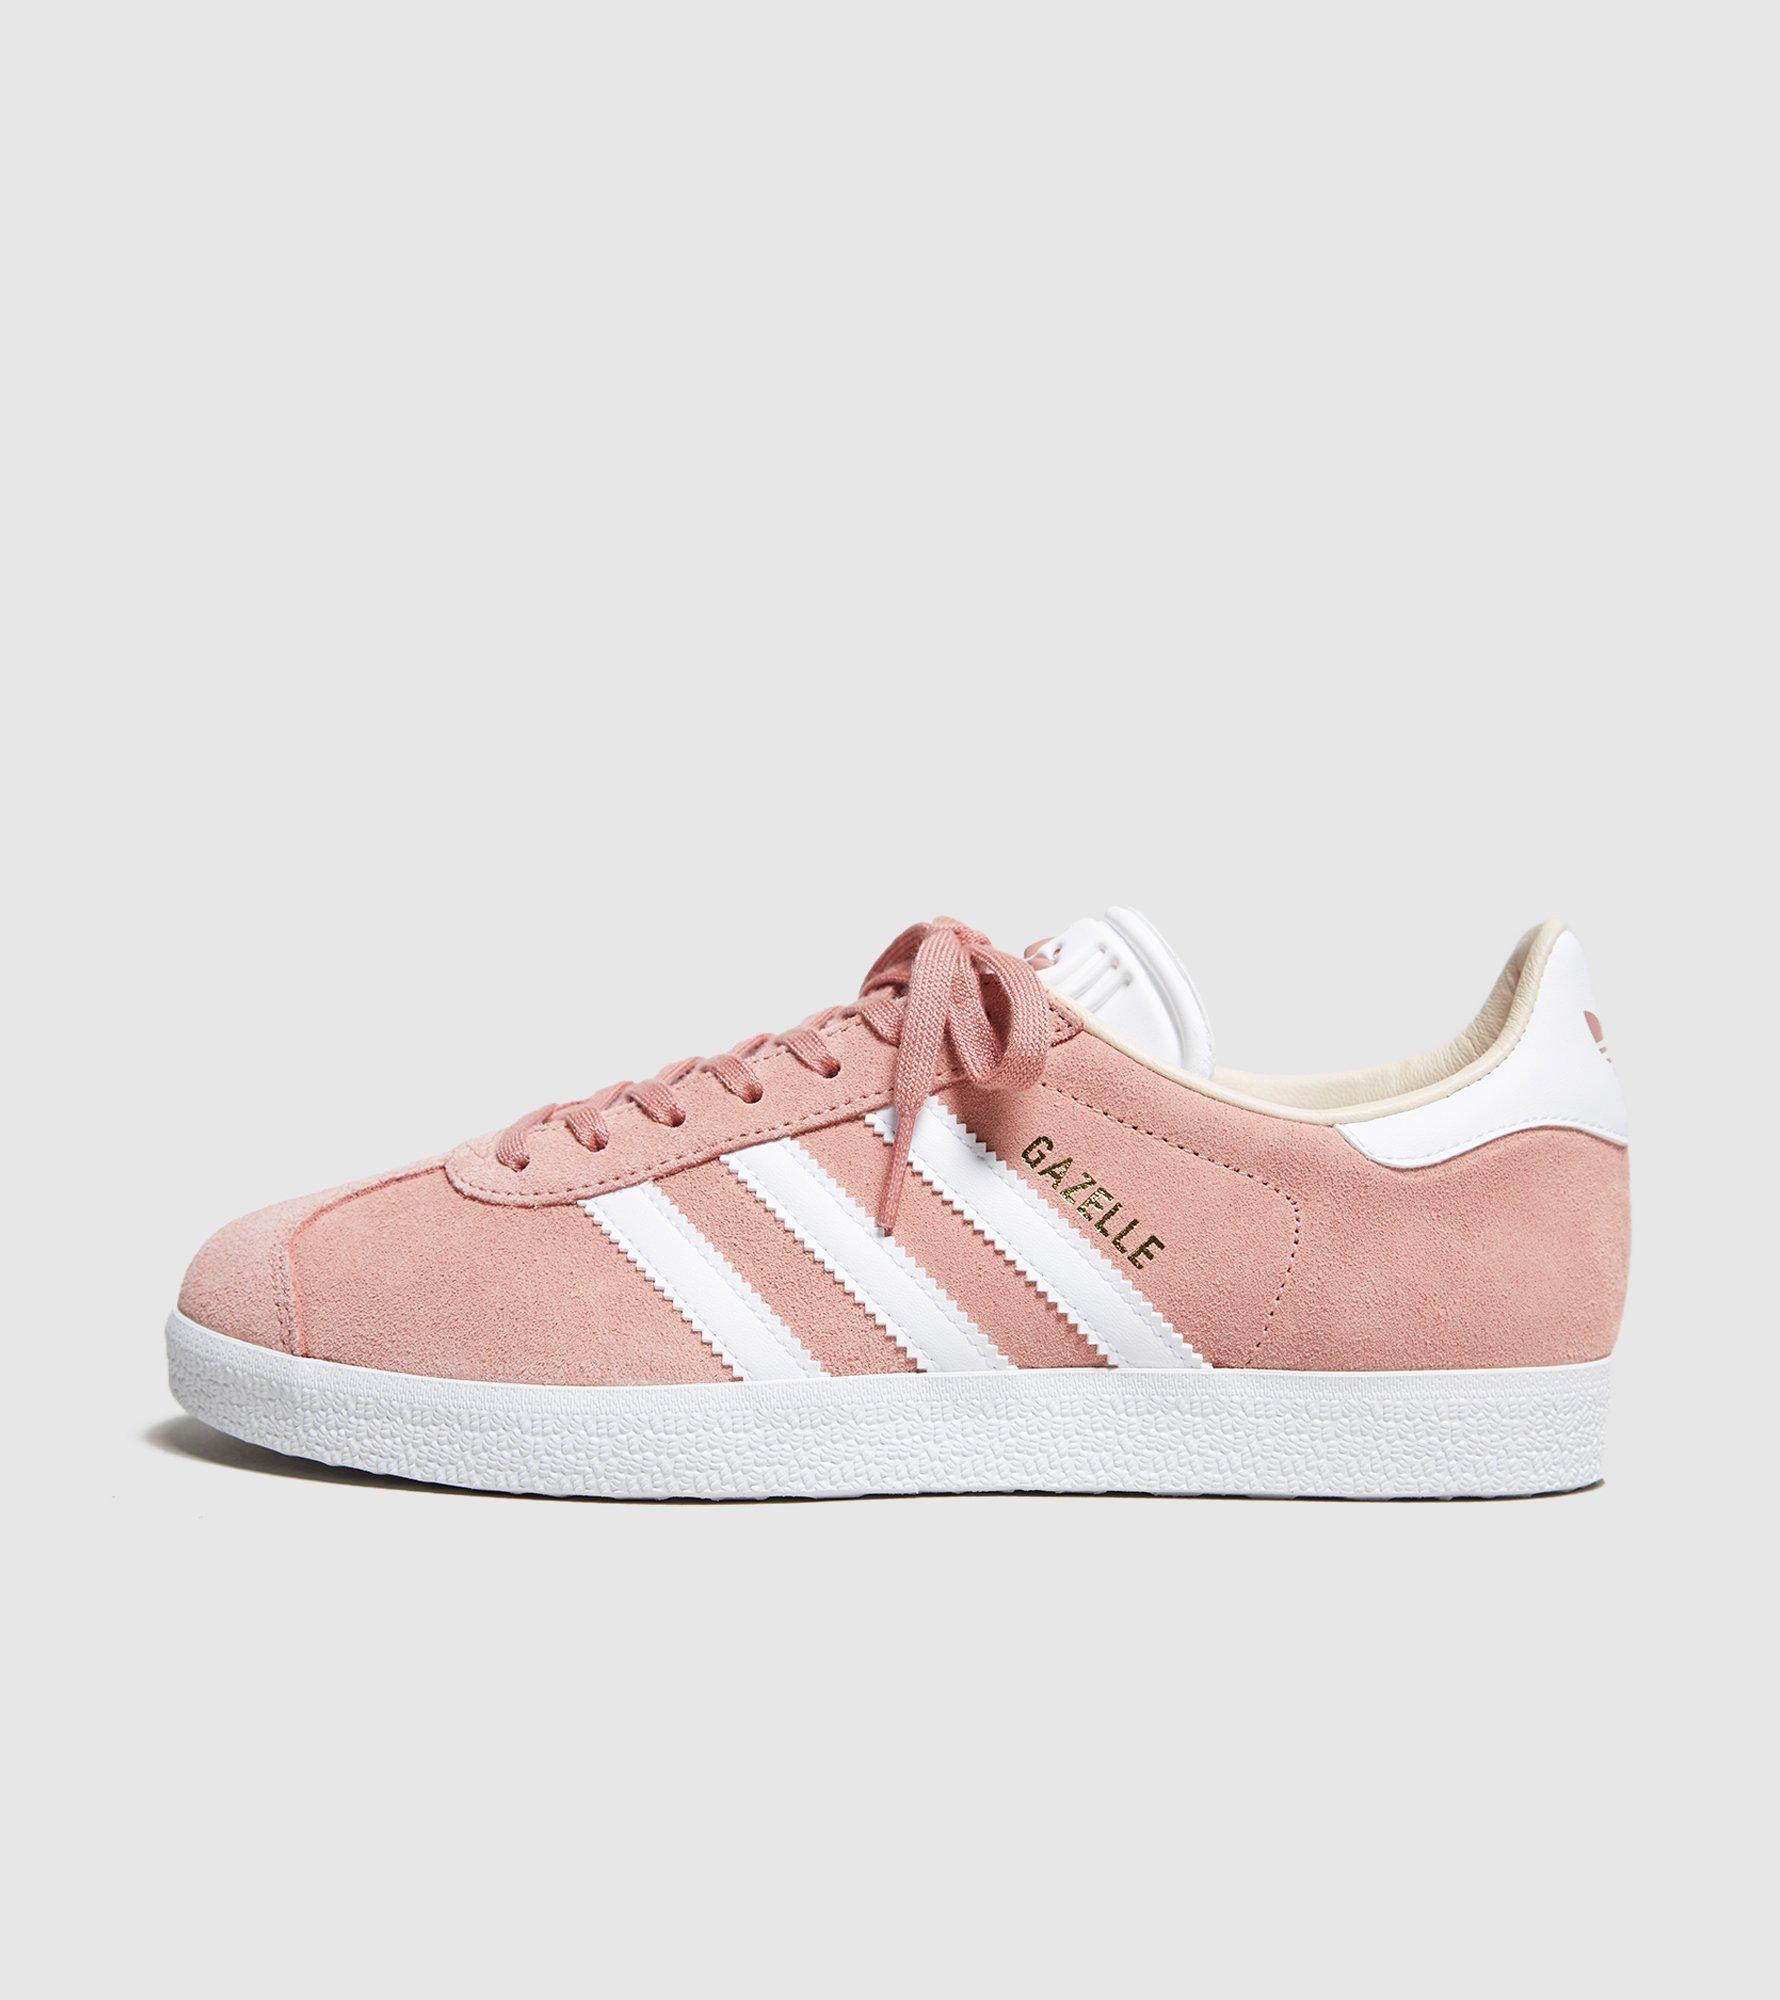 adidas gazelle shoes men 125 all pink adidas shoes women